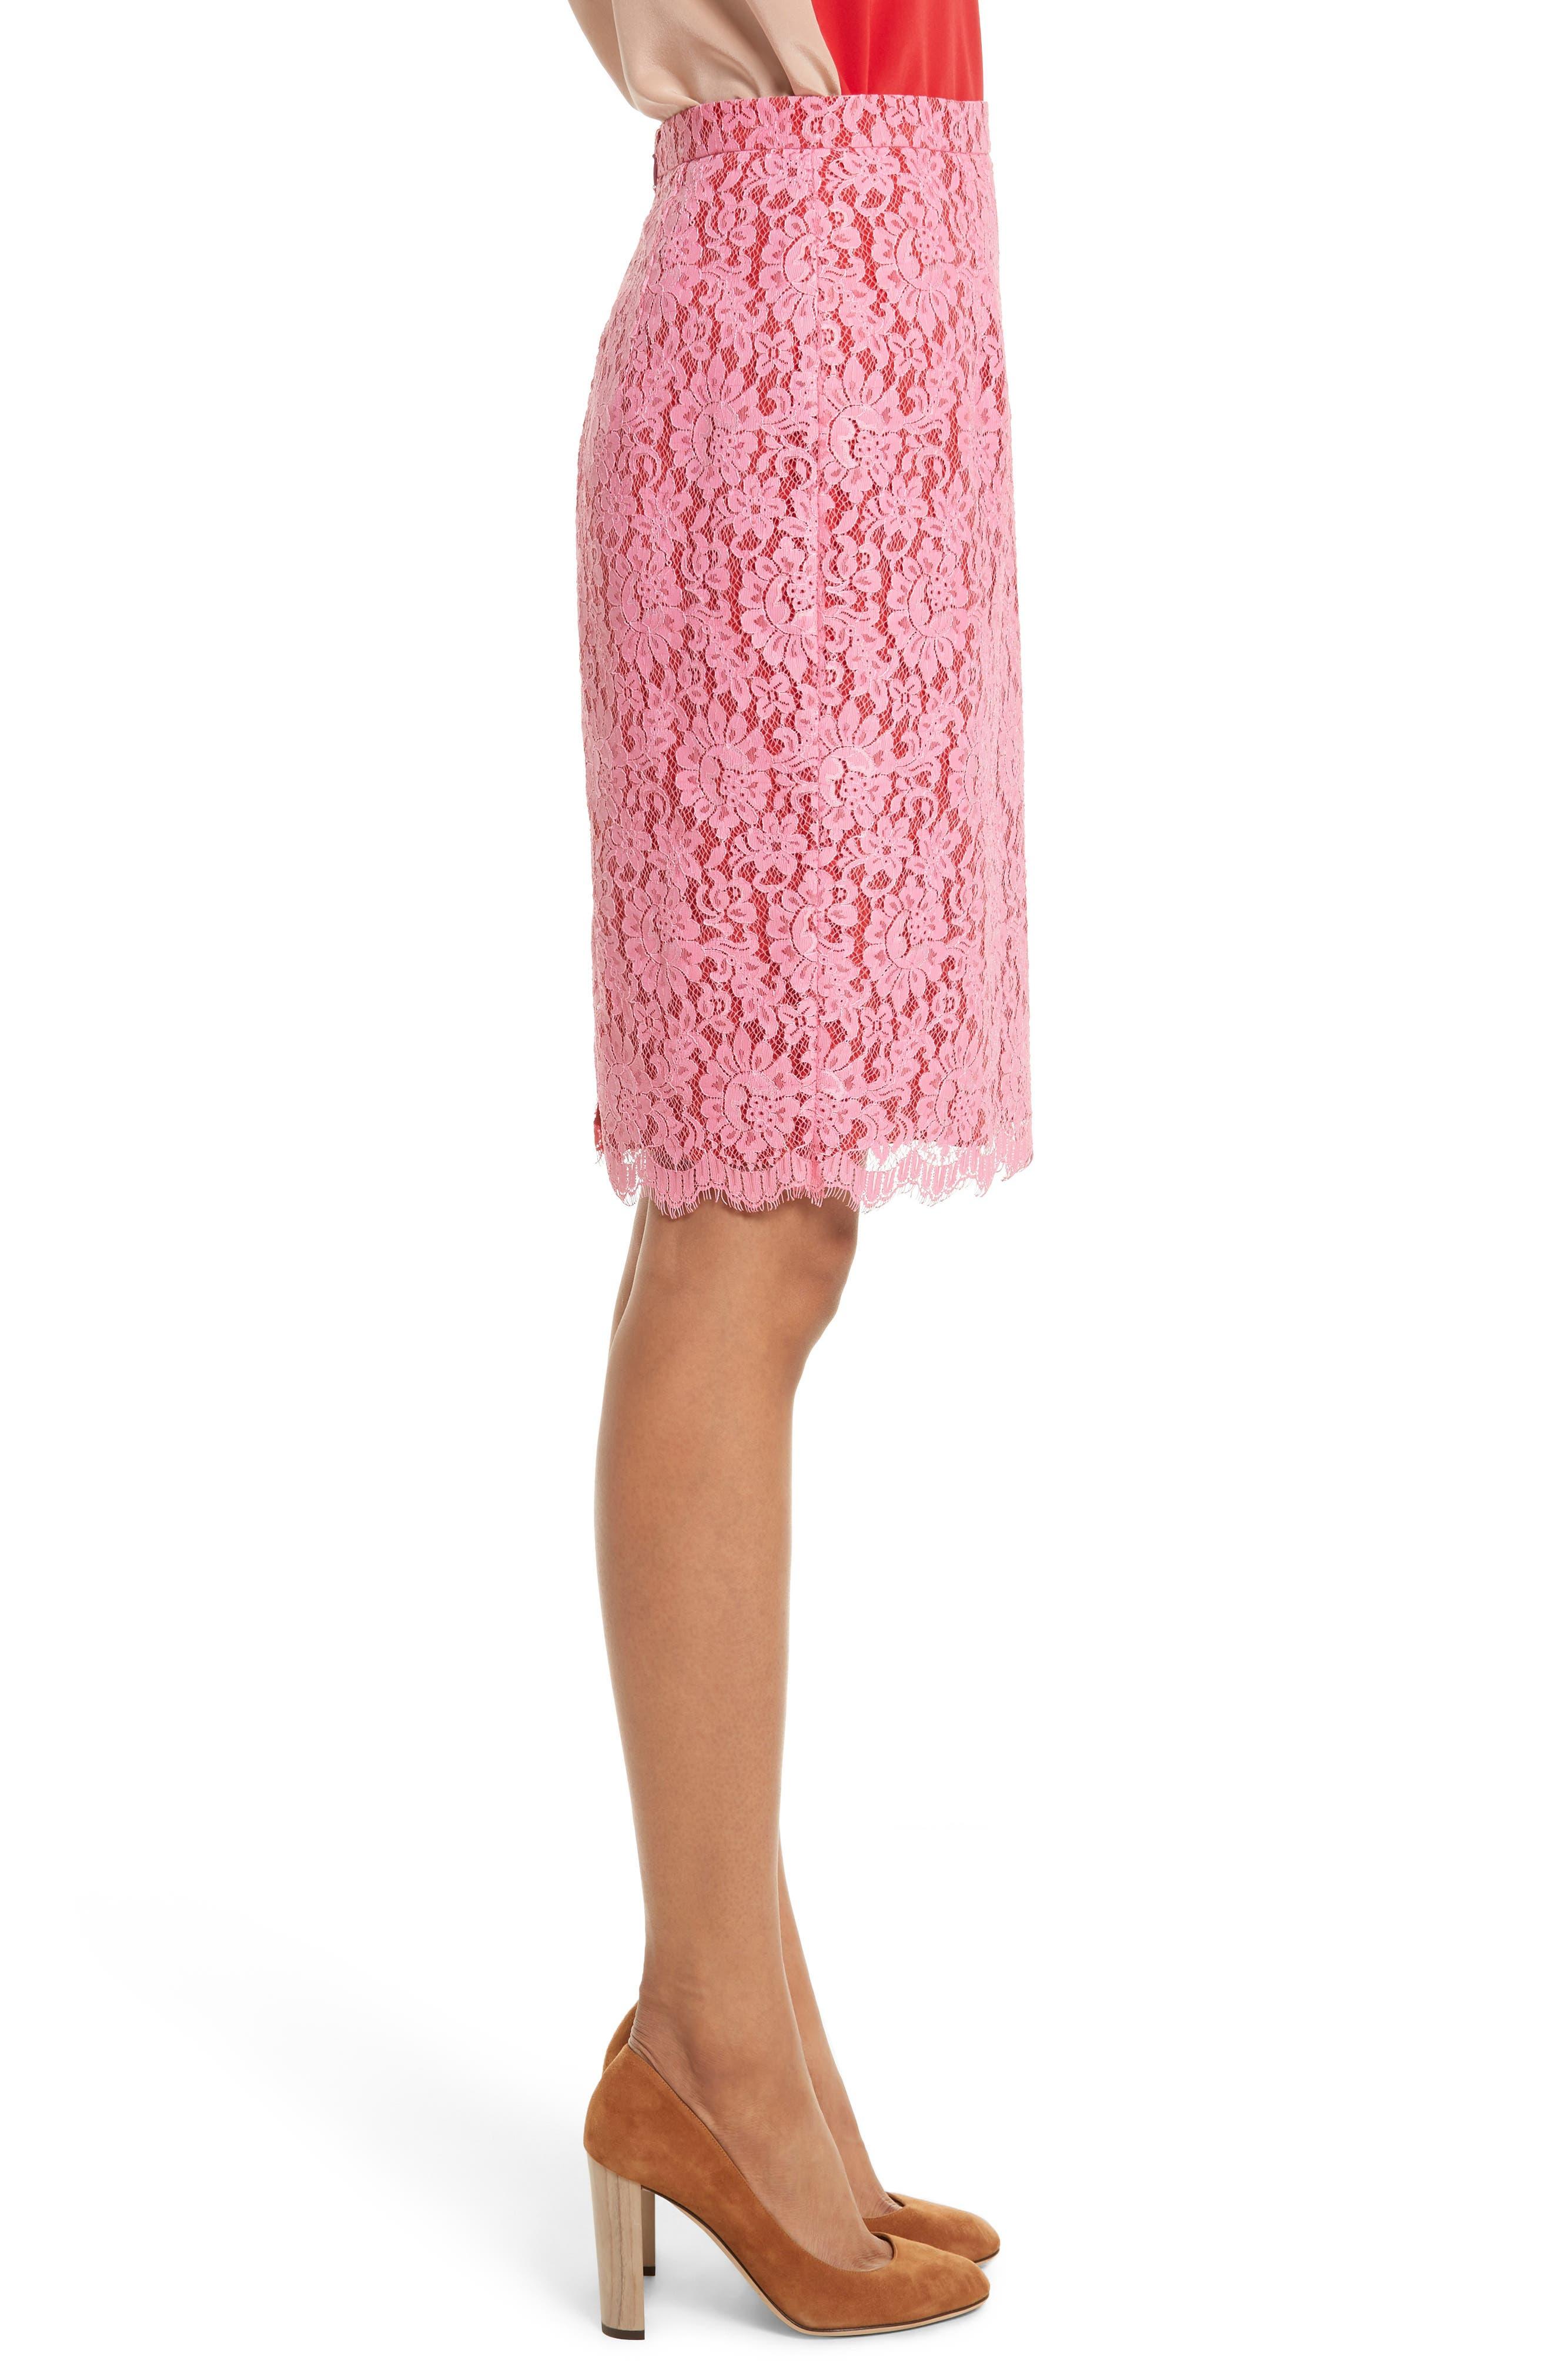 Lace Pencil Skirt,                             Alternate thumbnail 3, color,                             683